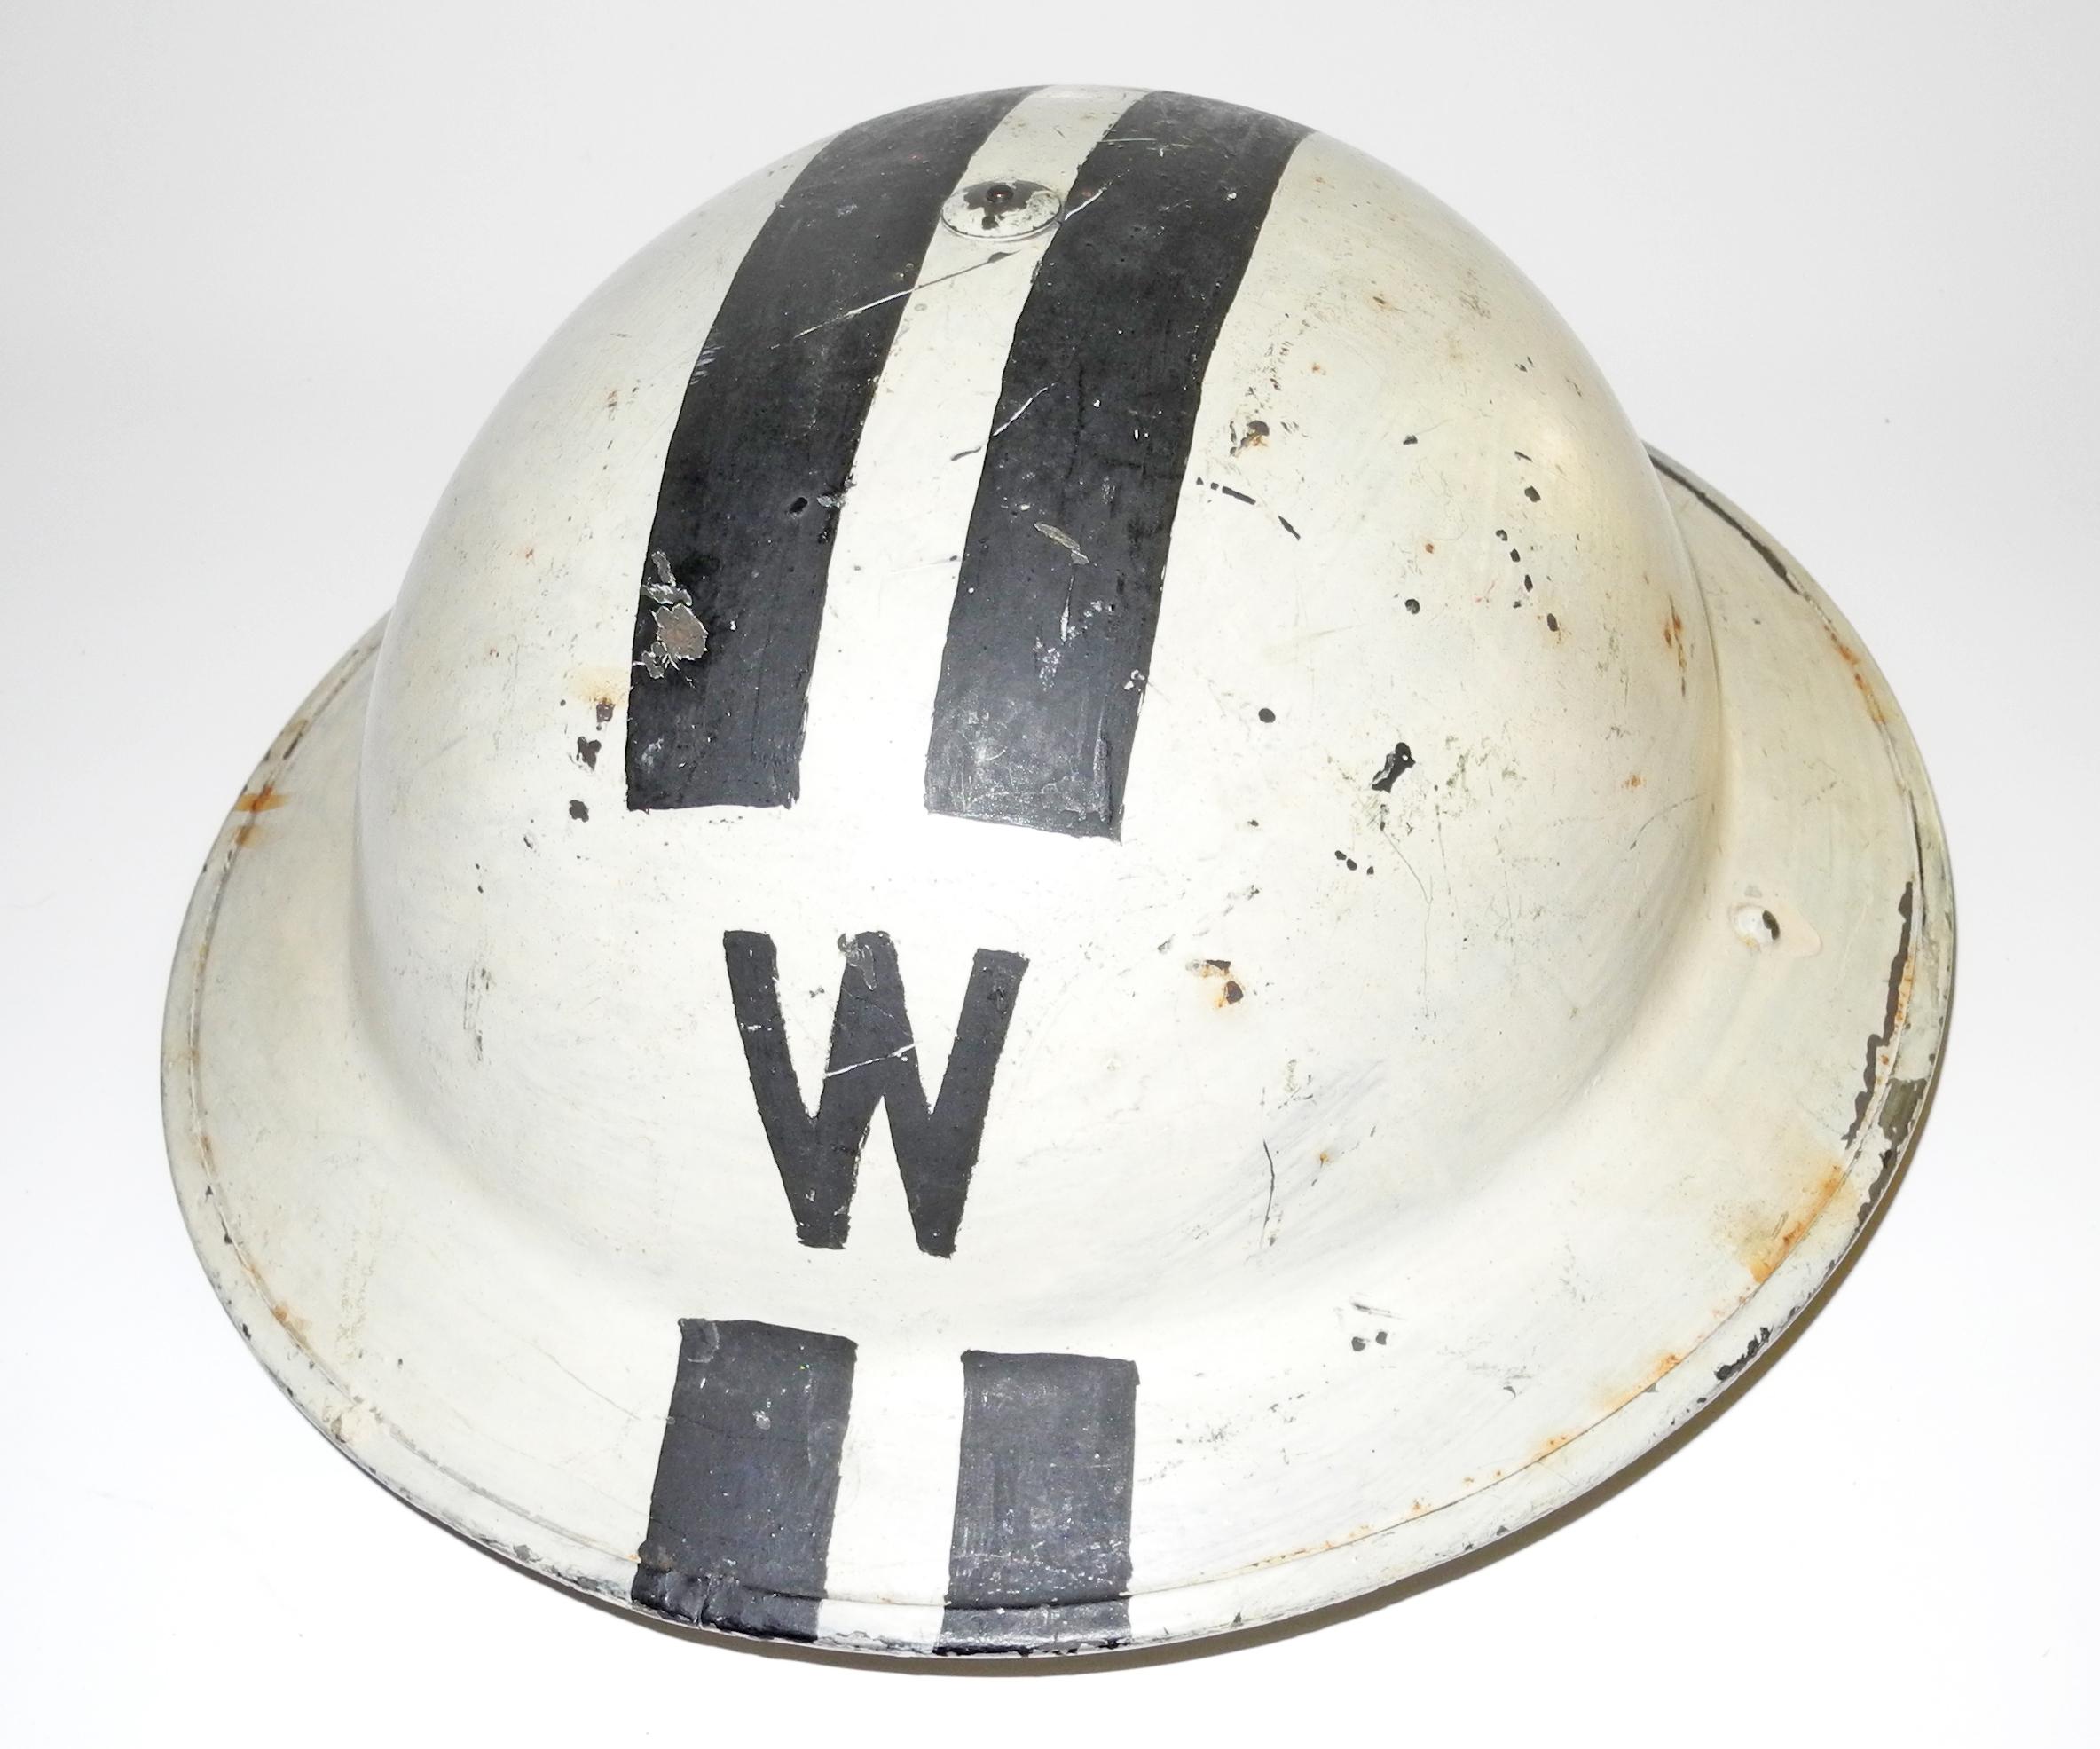 ARP Senior Warden's helmet